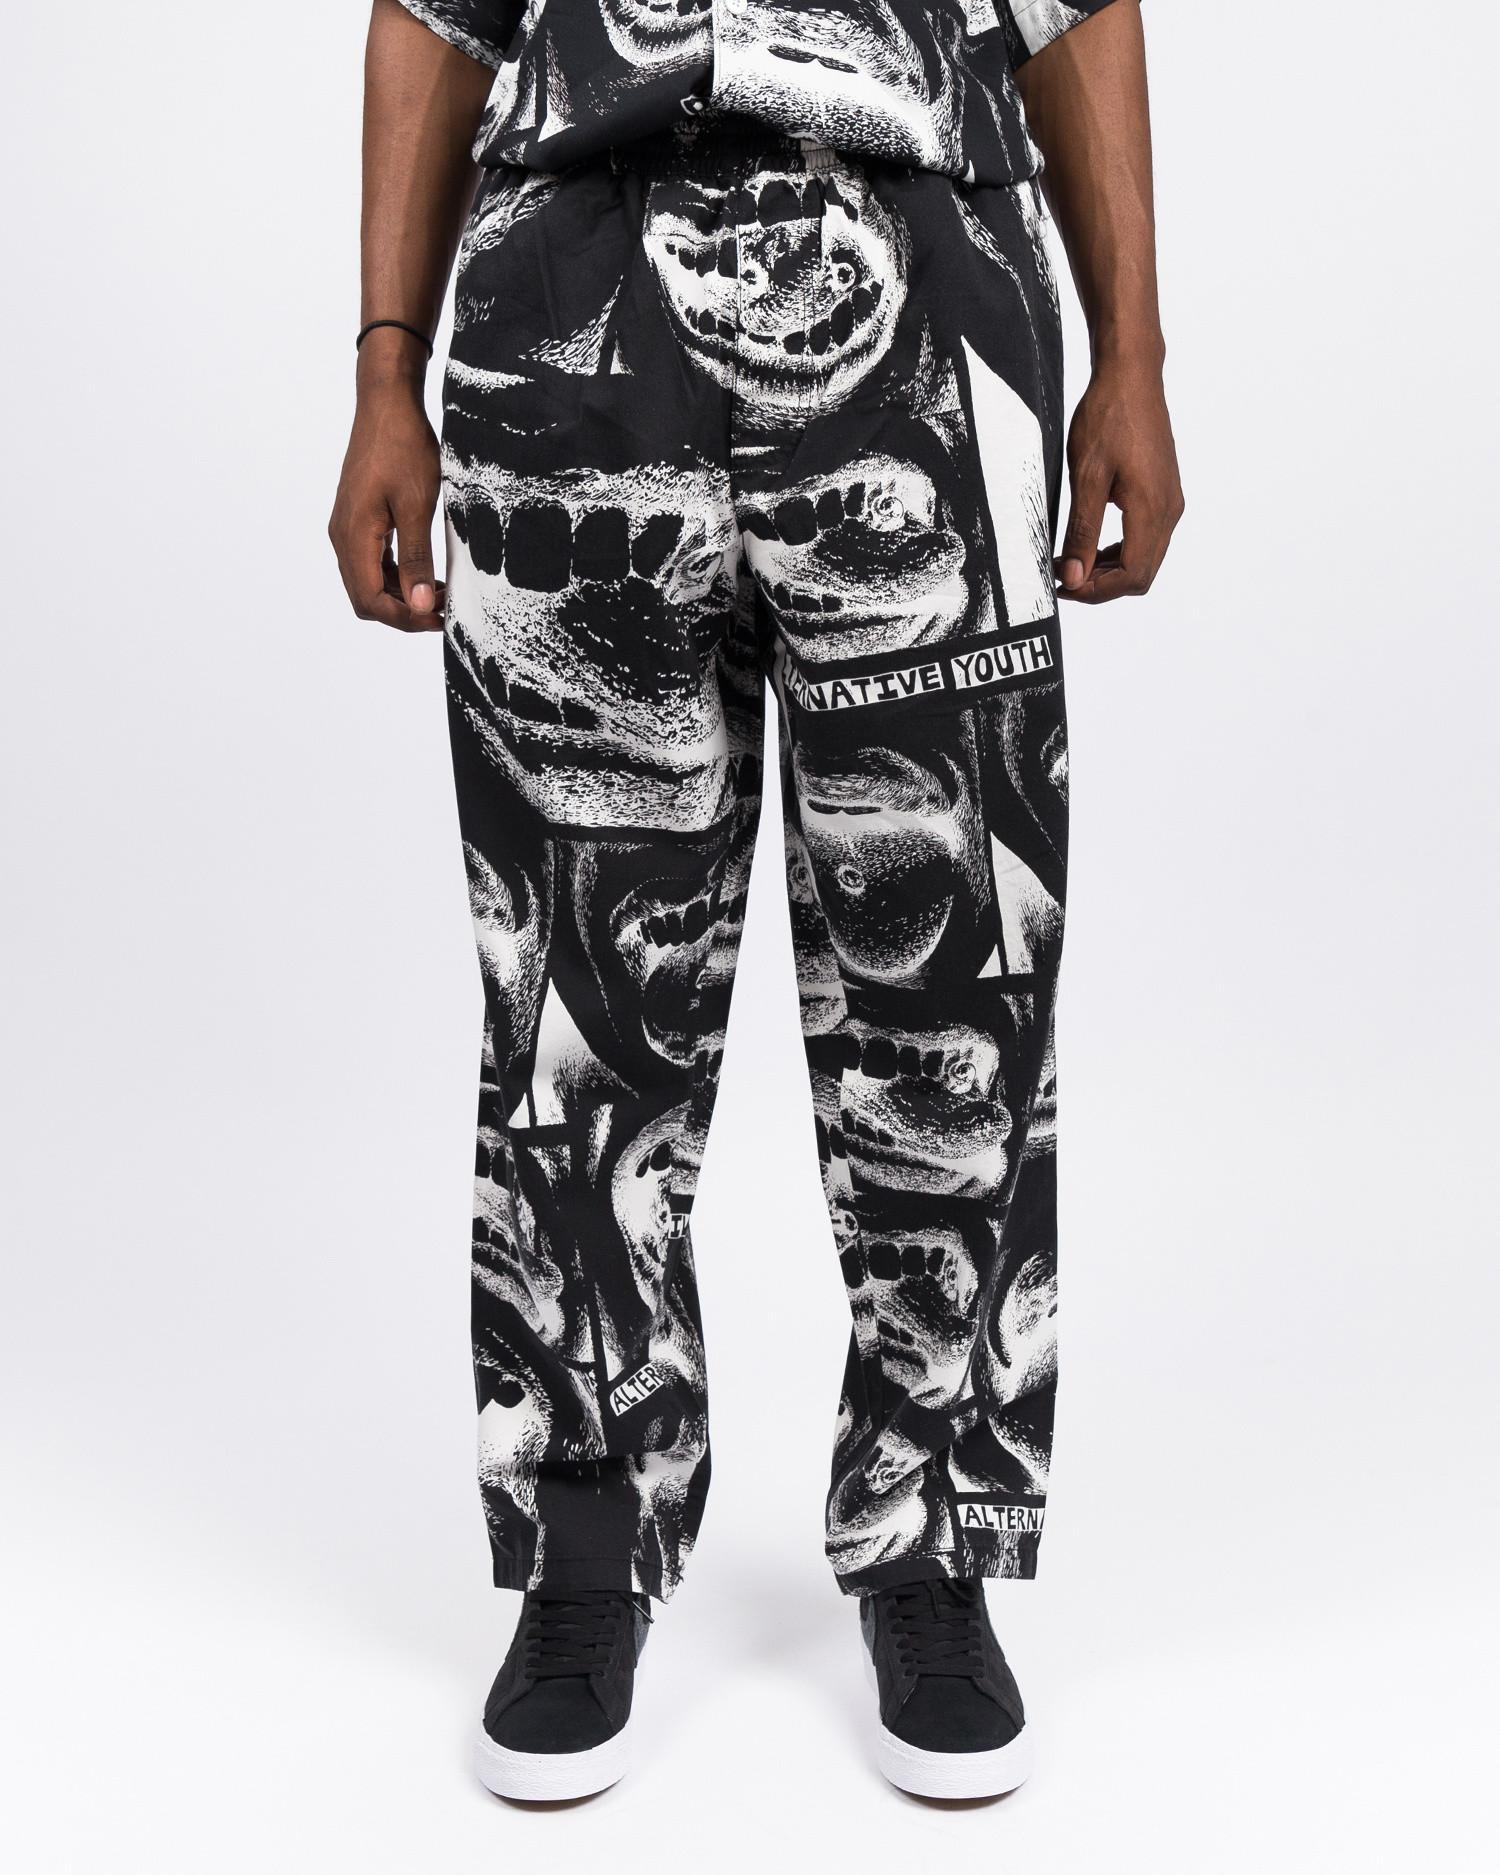 Polar X Iggy Alternative Youth Pants Black